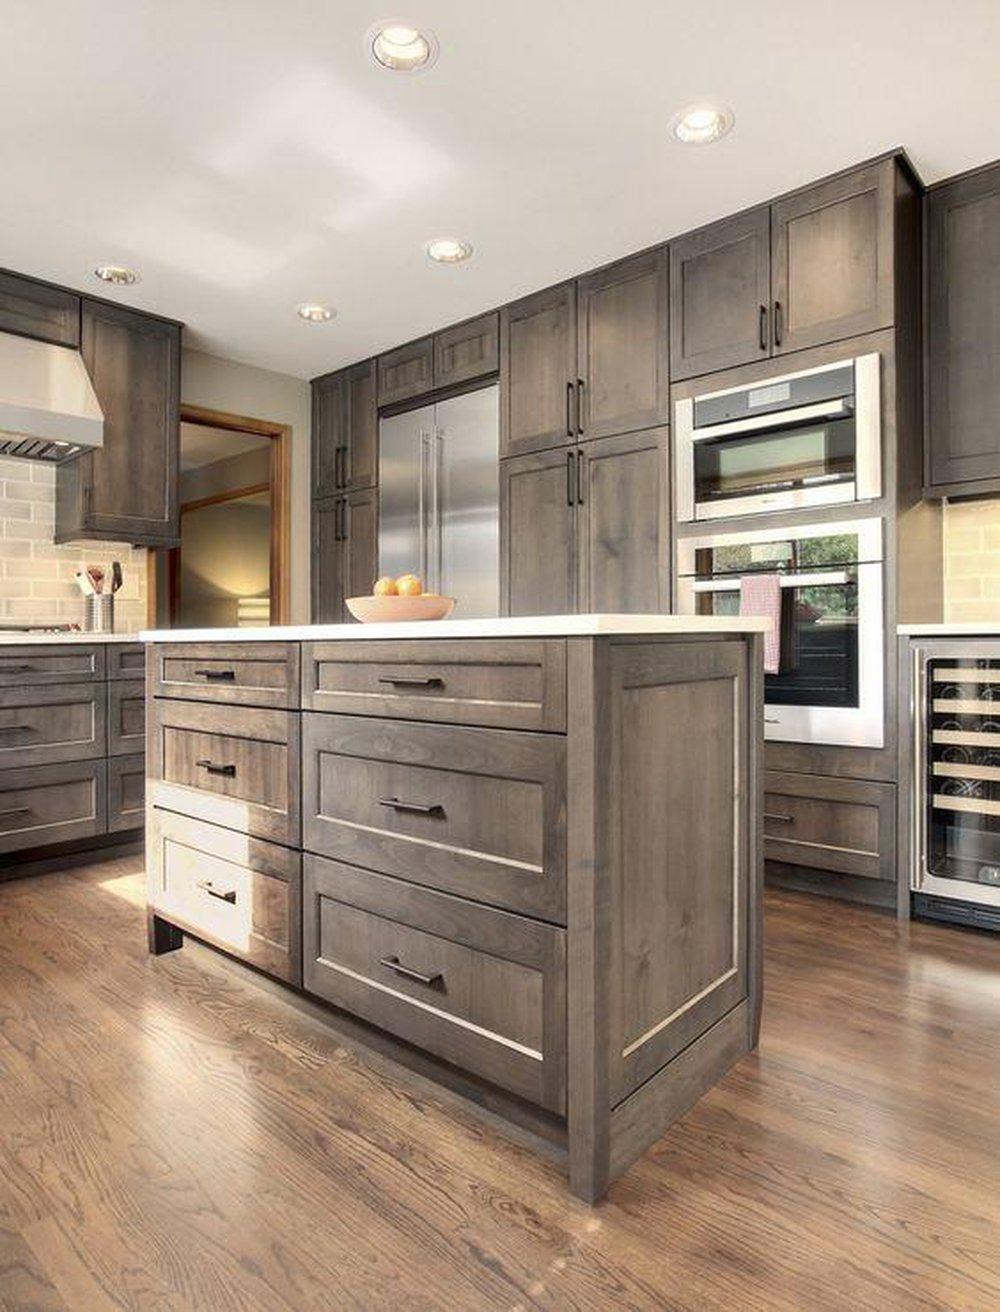 Skrinky v kuchyni až po strop